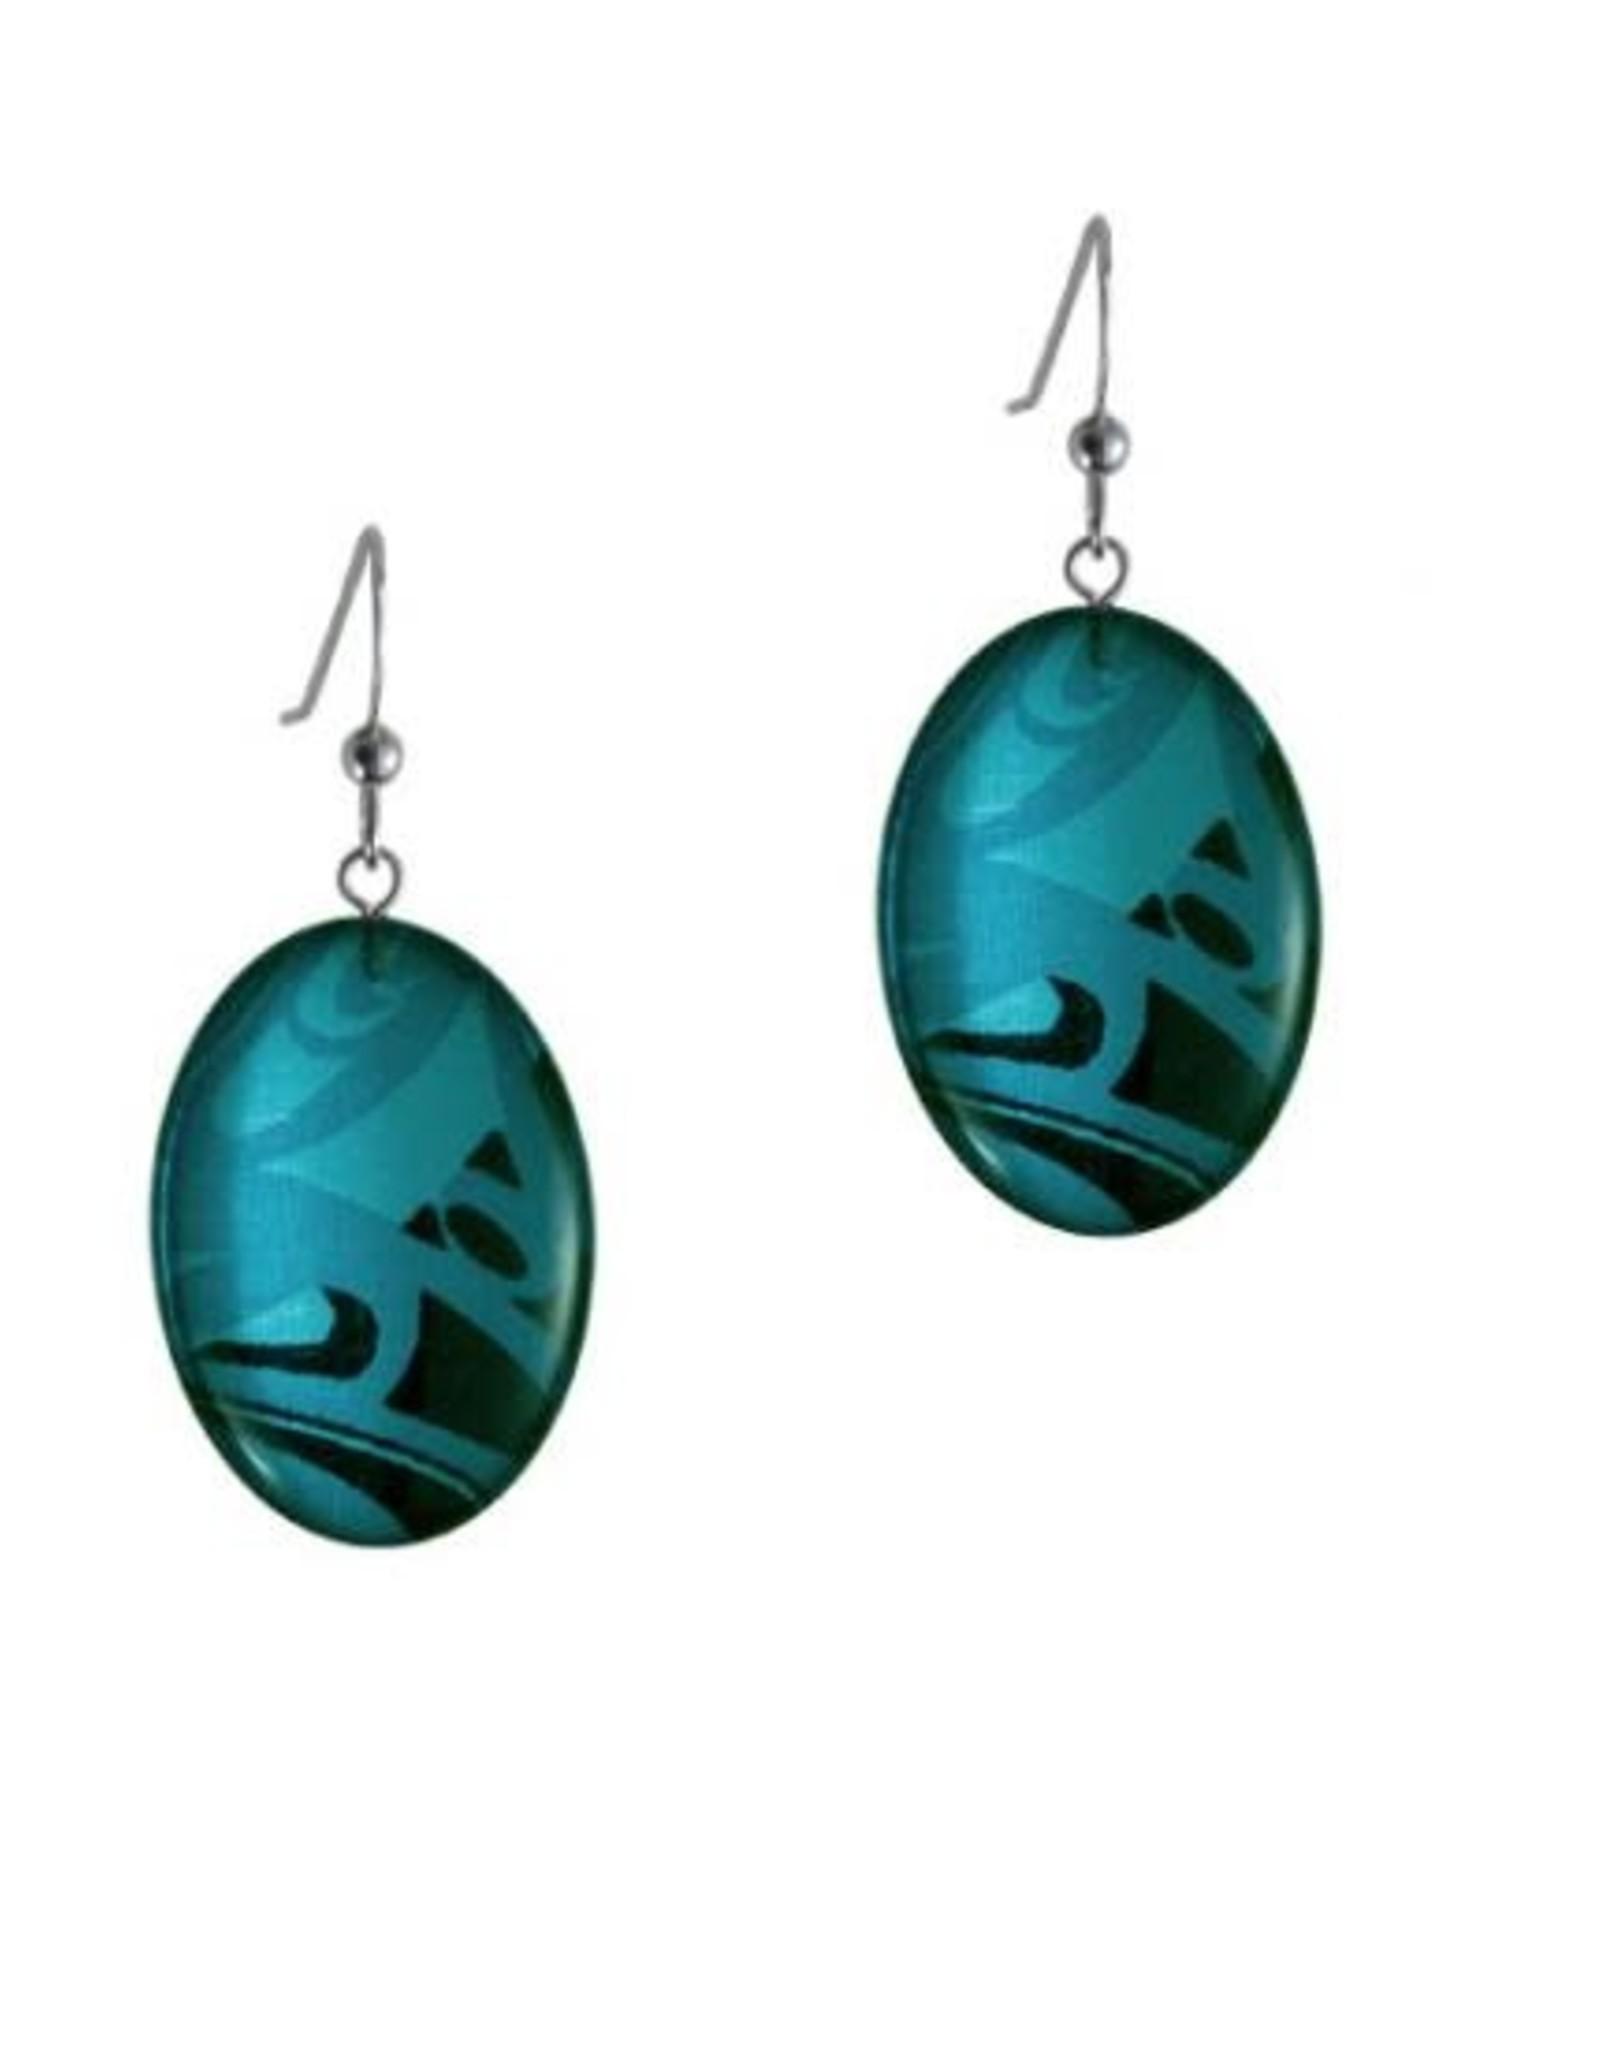 Silk Inspirations Earrings by Corrine Hunt